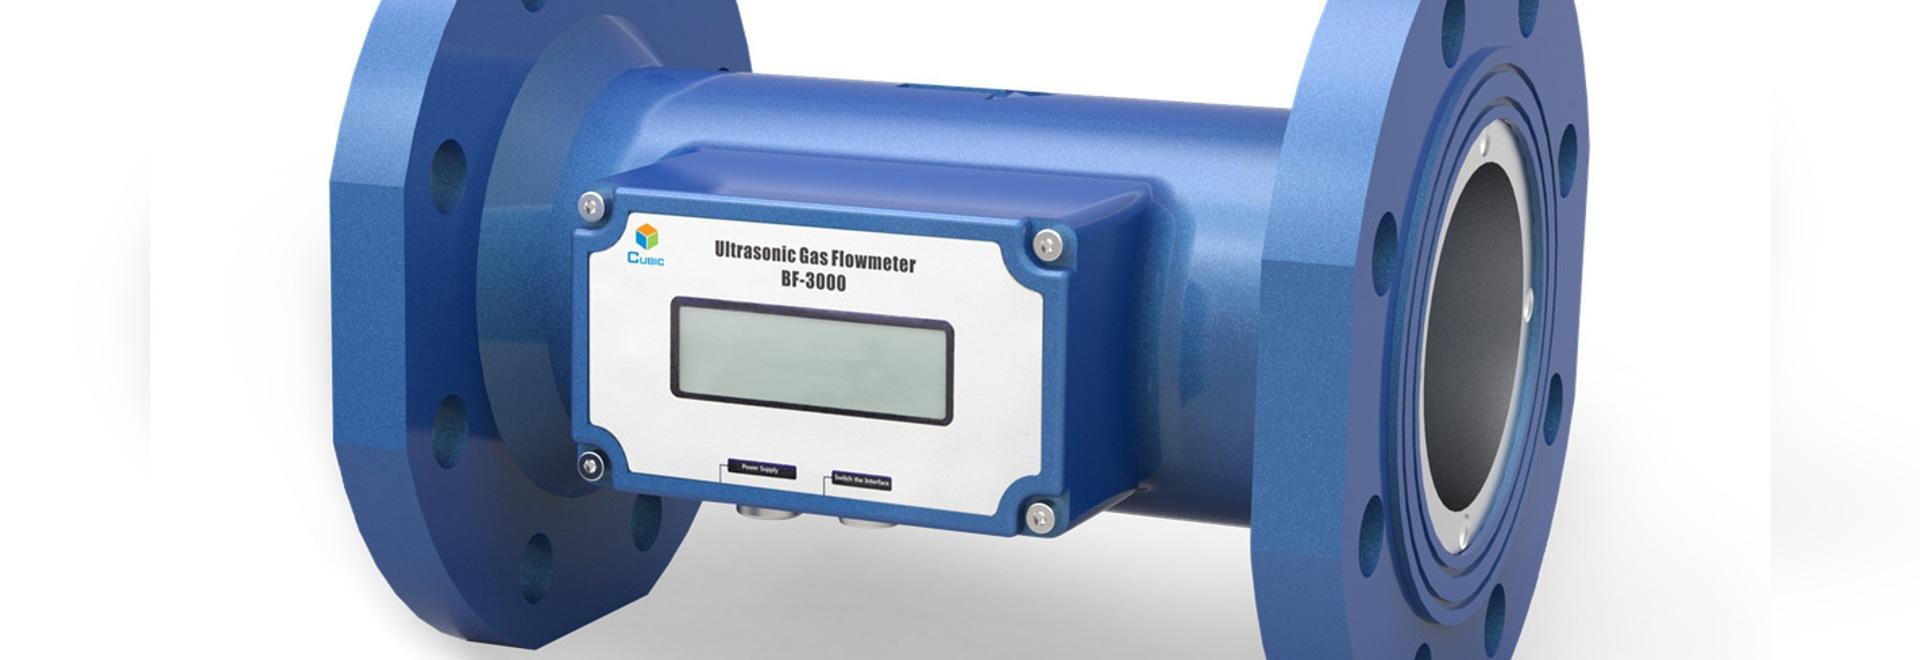 Ultrasonic Biogas Flowmeter--BF-3000